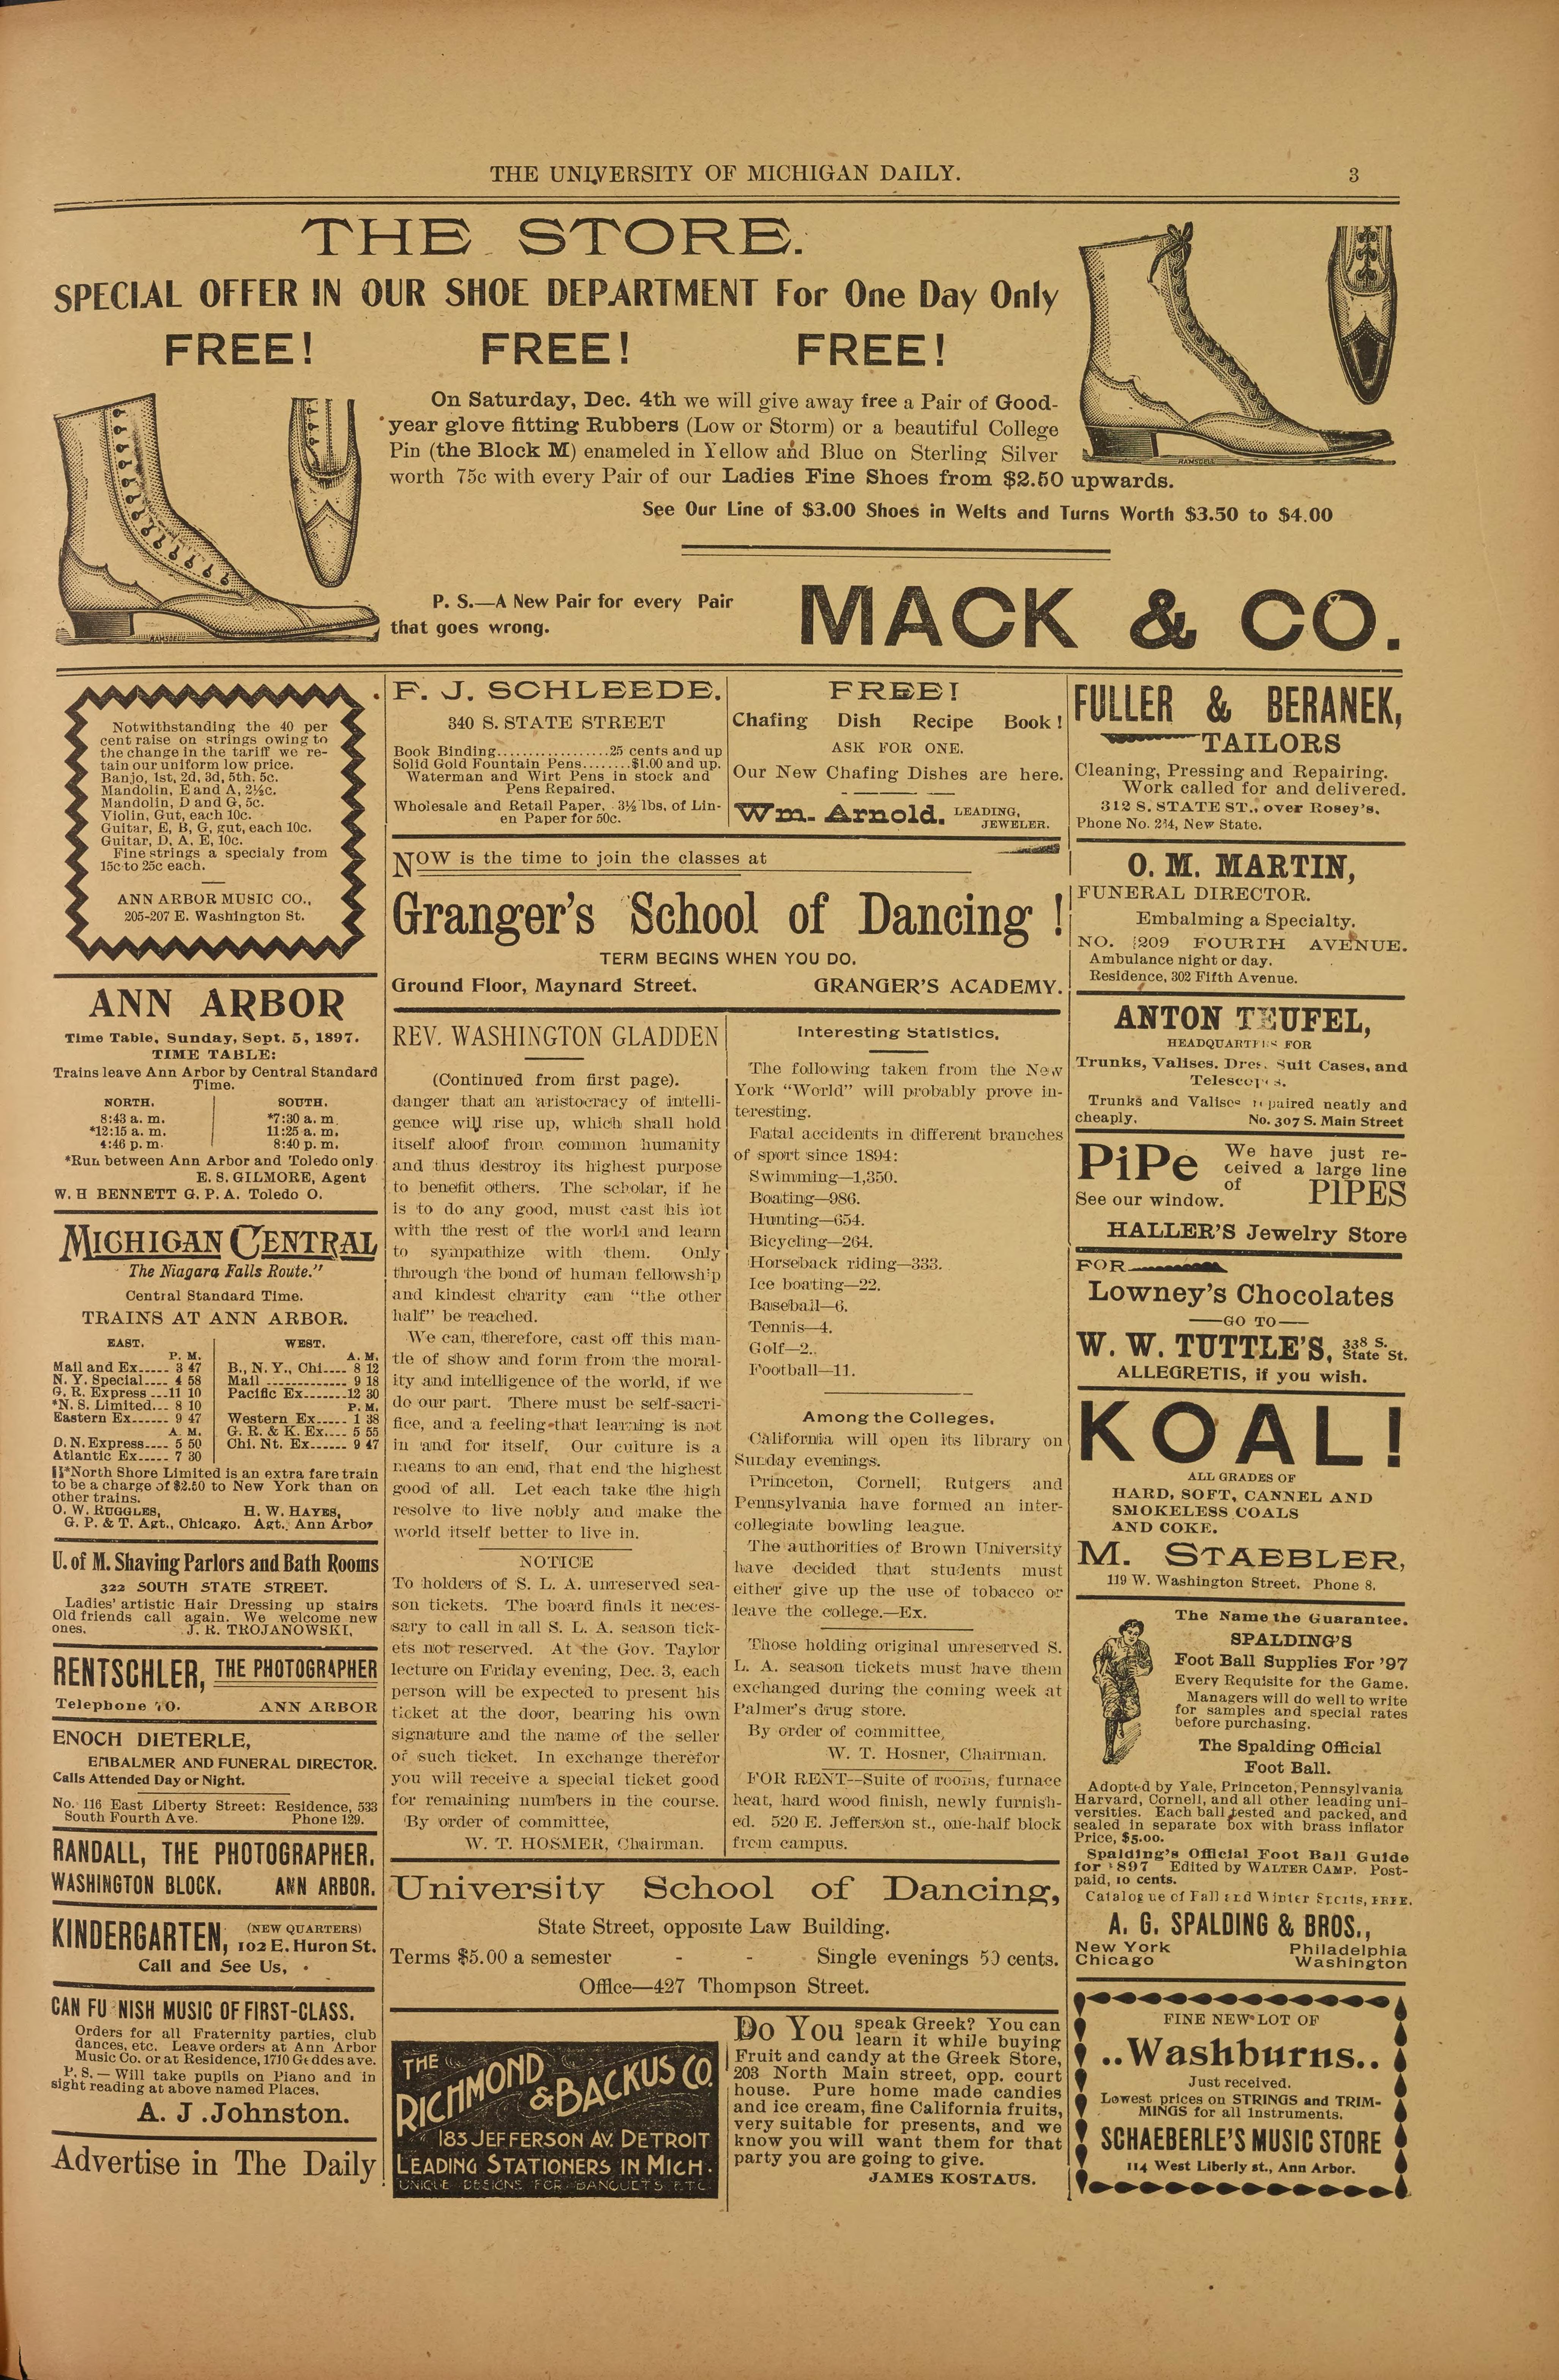 Michigan Daily Digital Archives - December 04, 1897 (vol  8